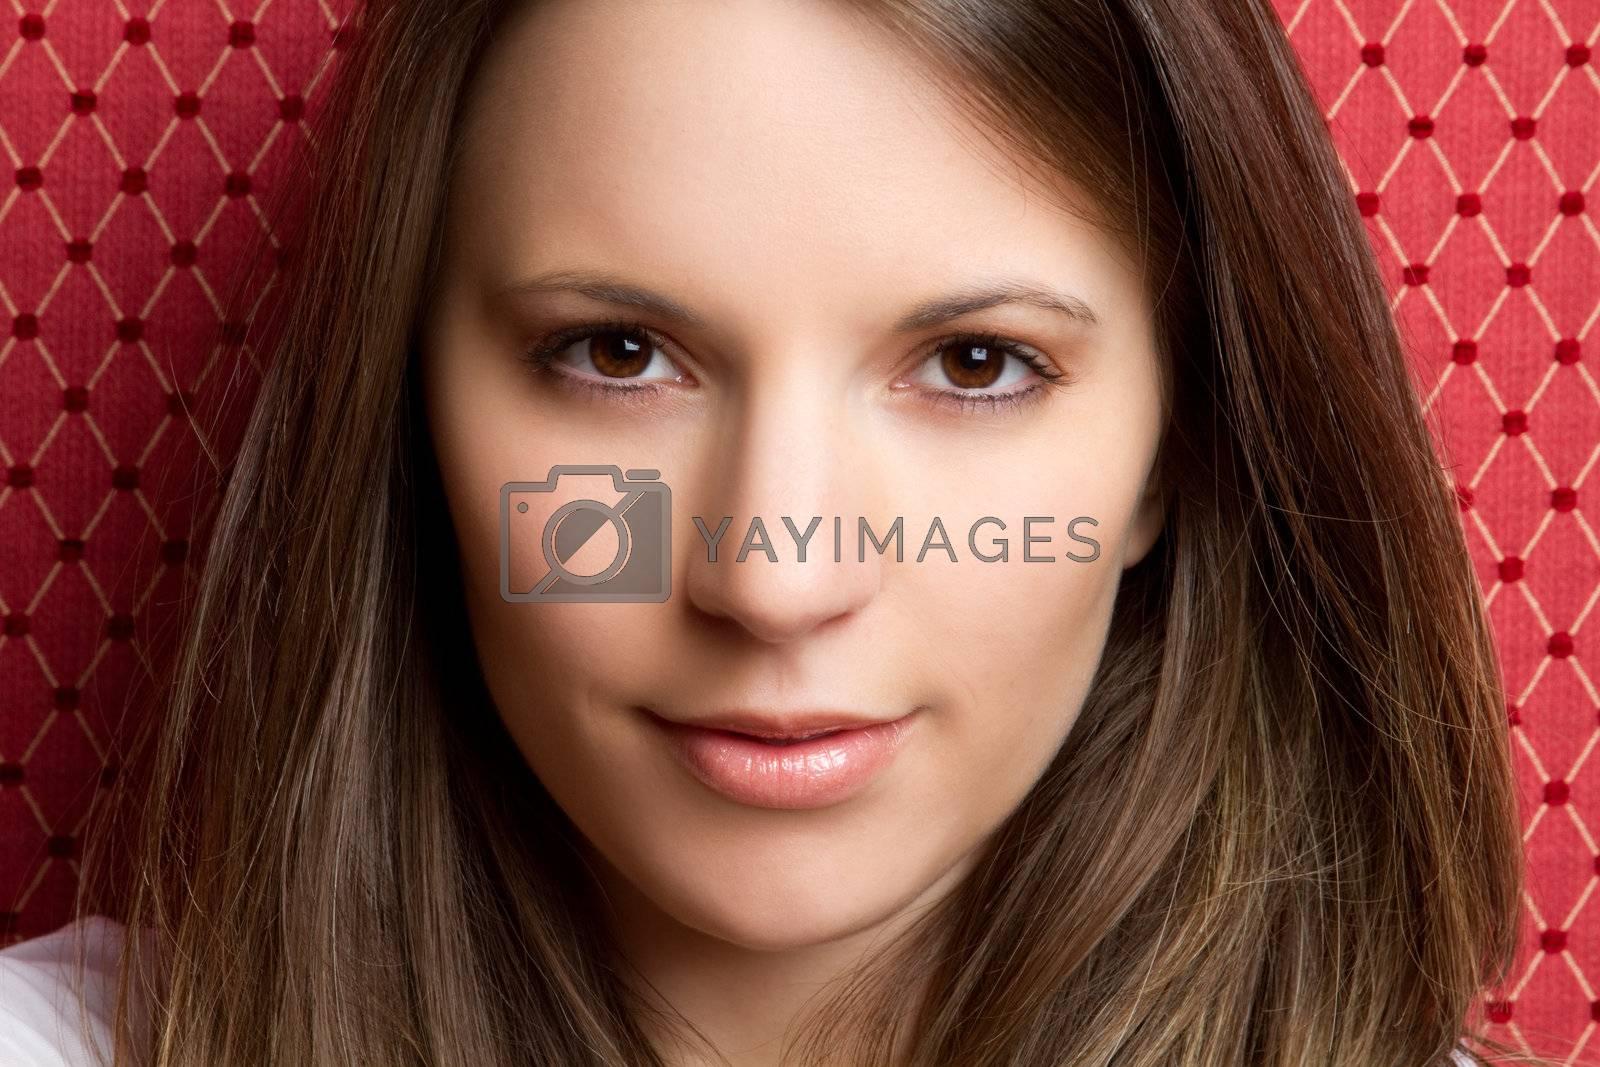 Beautiful smiling portrait of woman